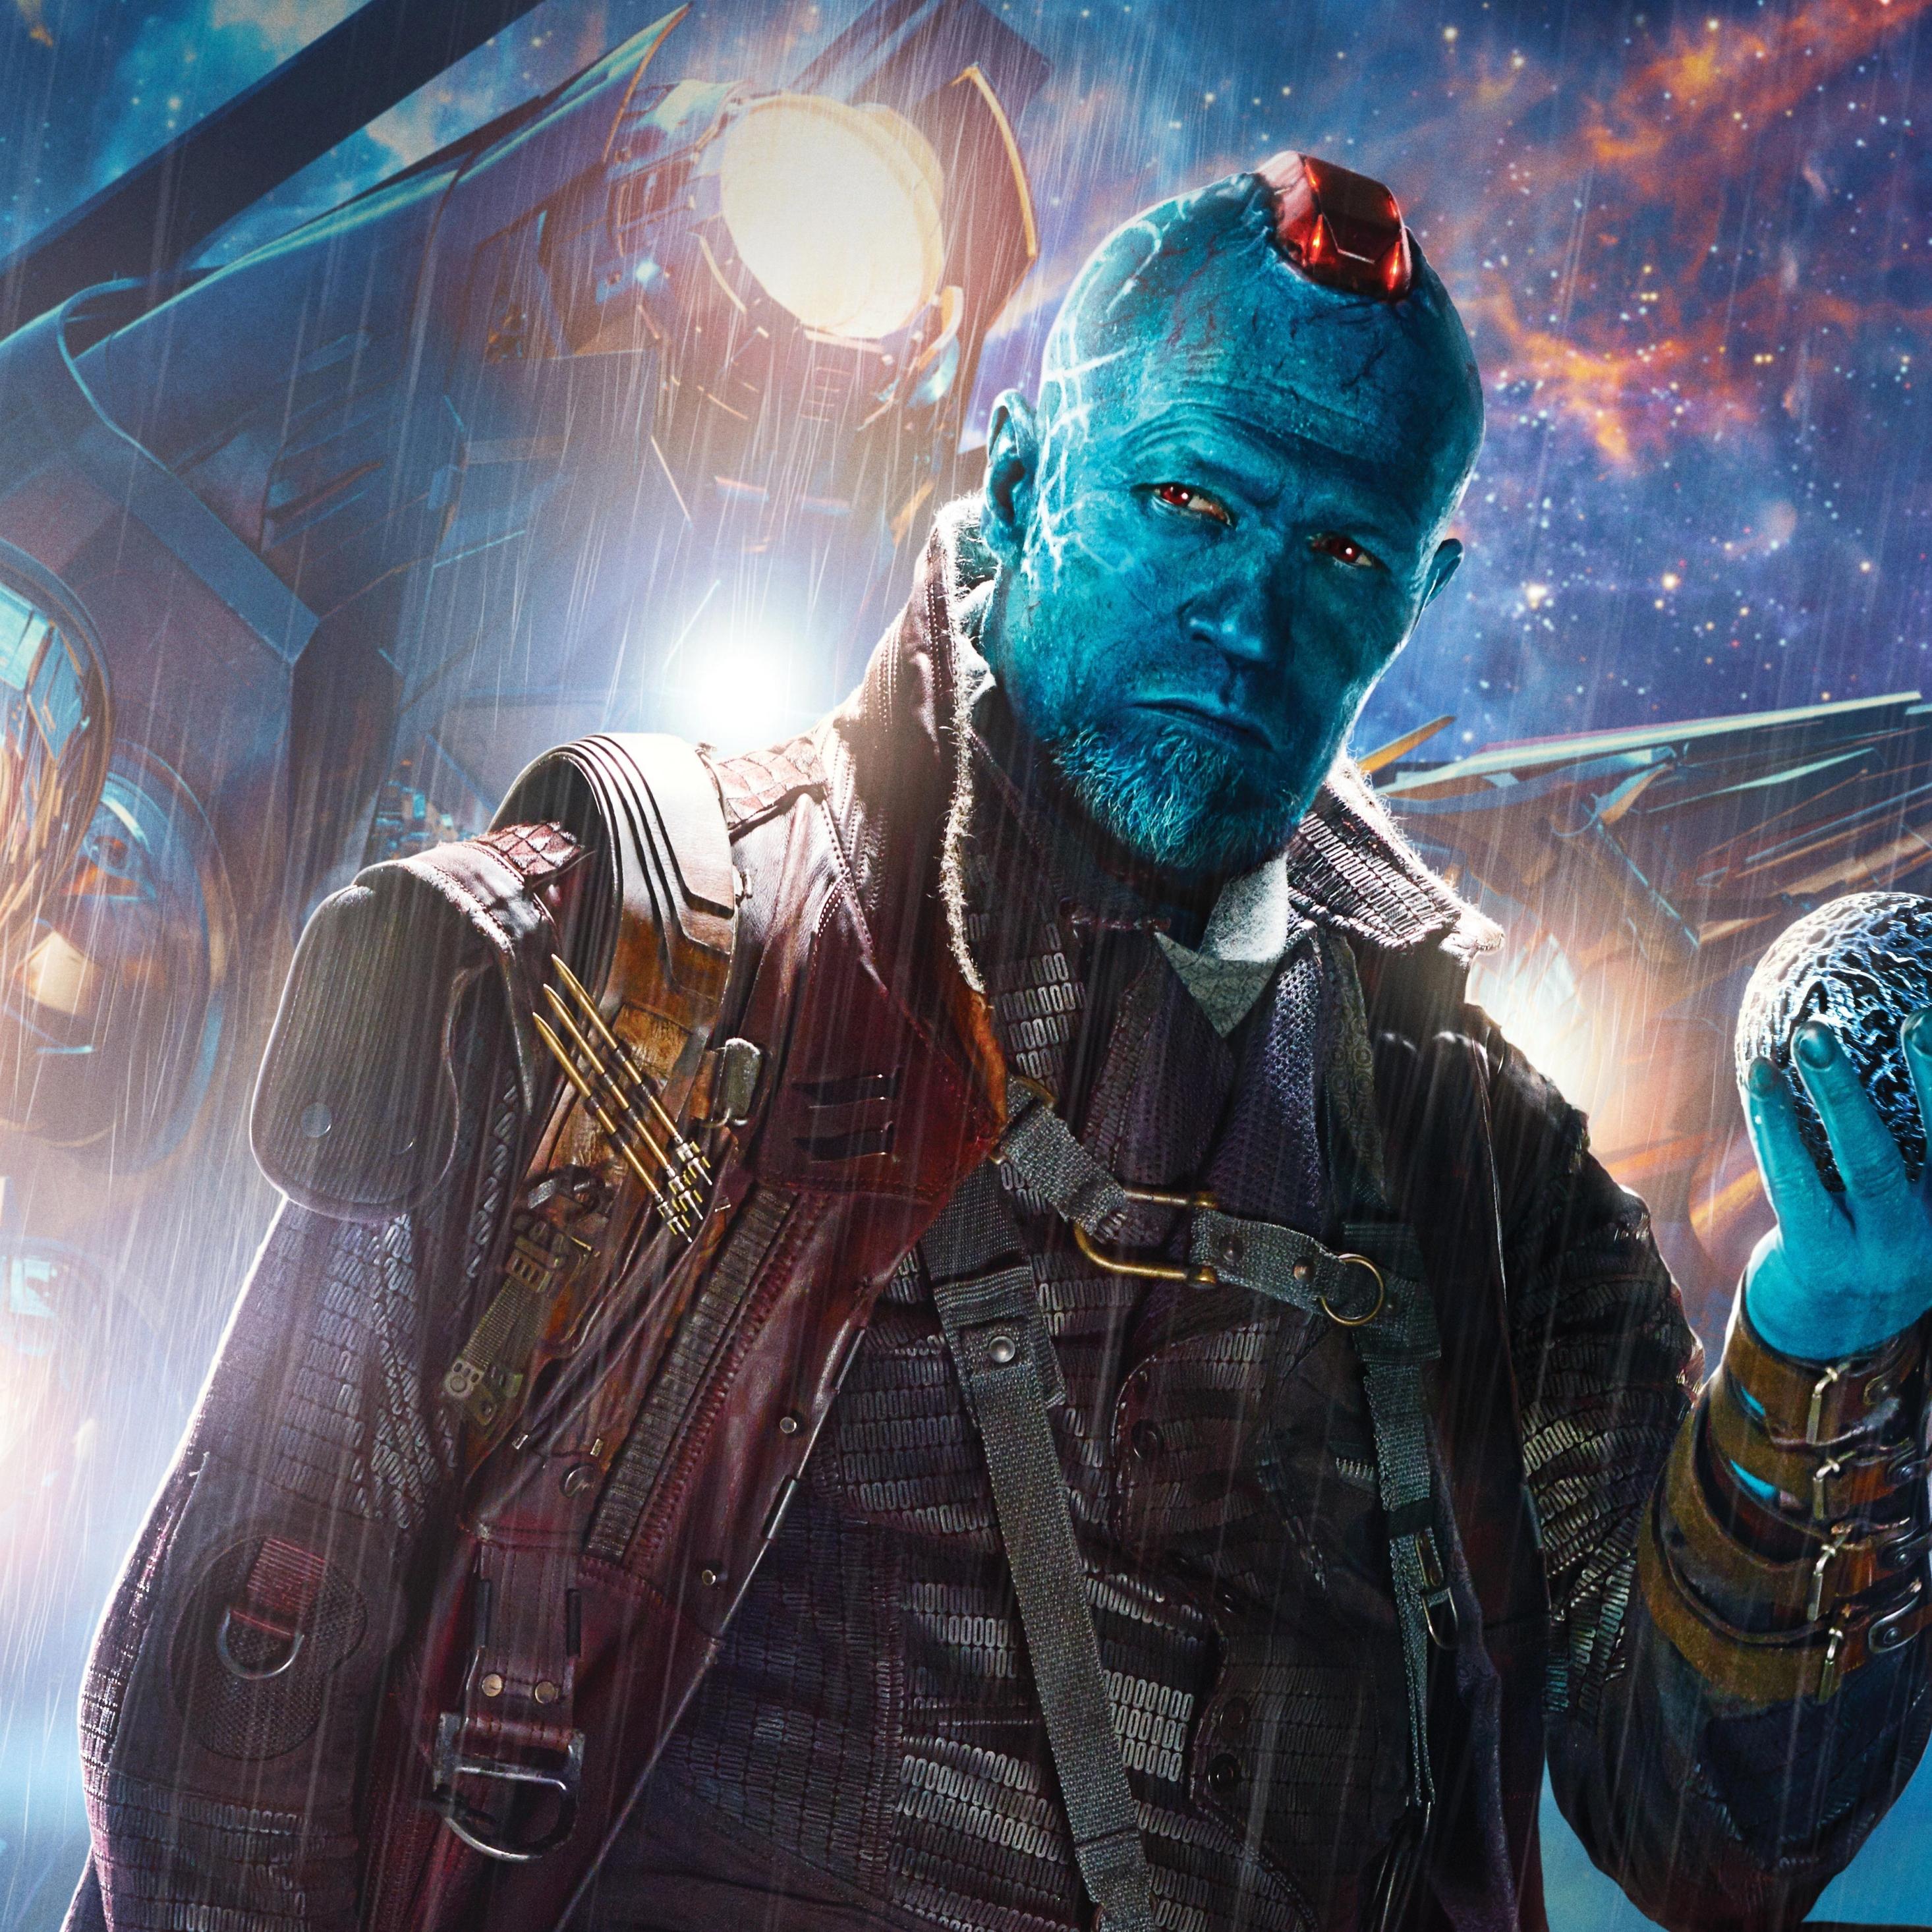 Yondu Udonta Guardians Of The Galaxy Hd 4k Wallpaper